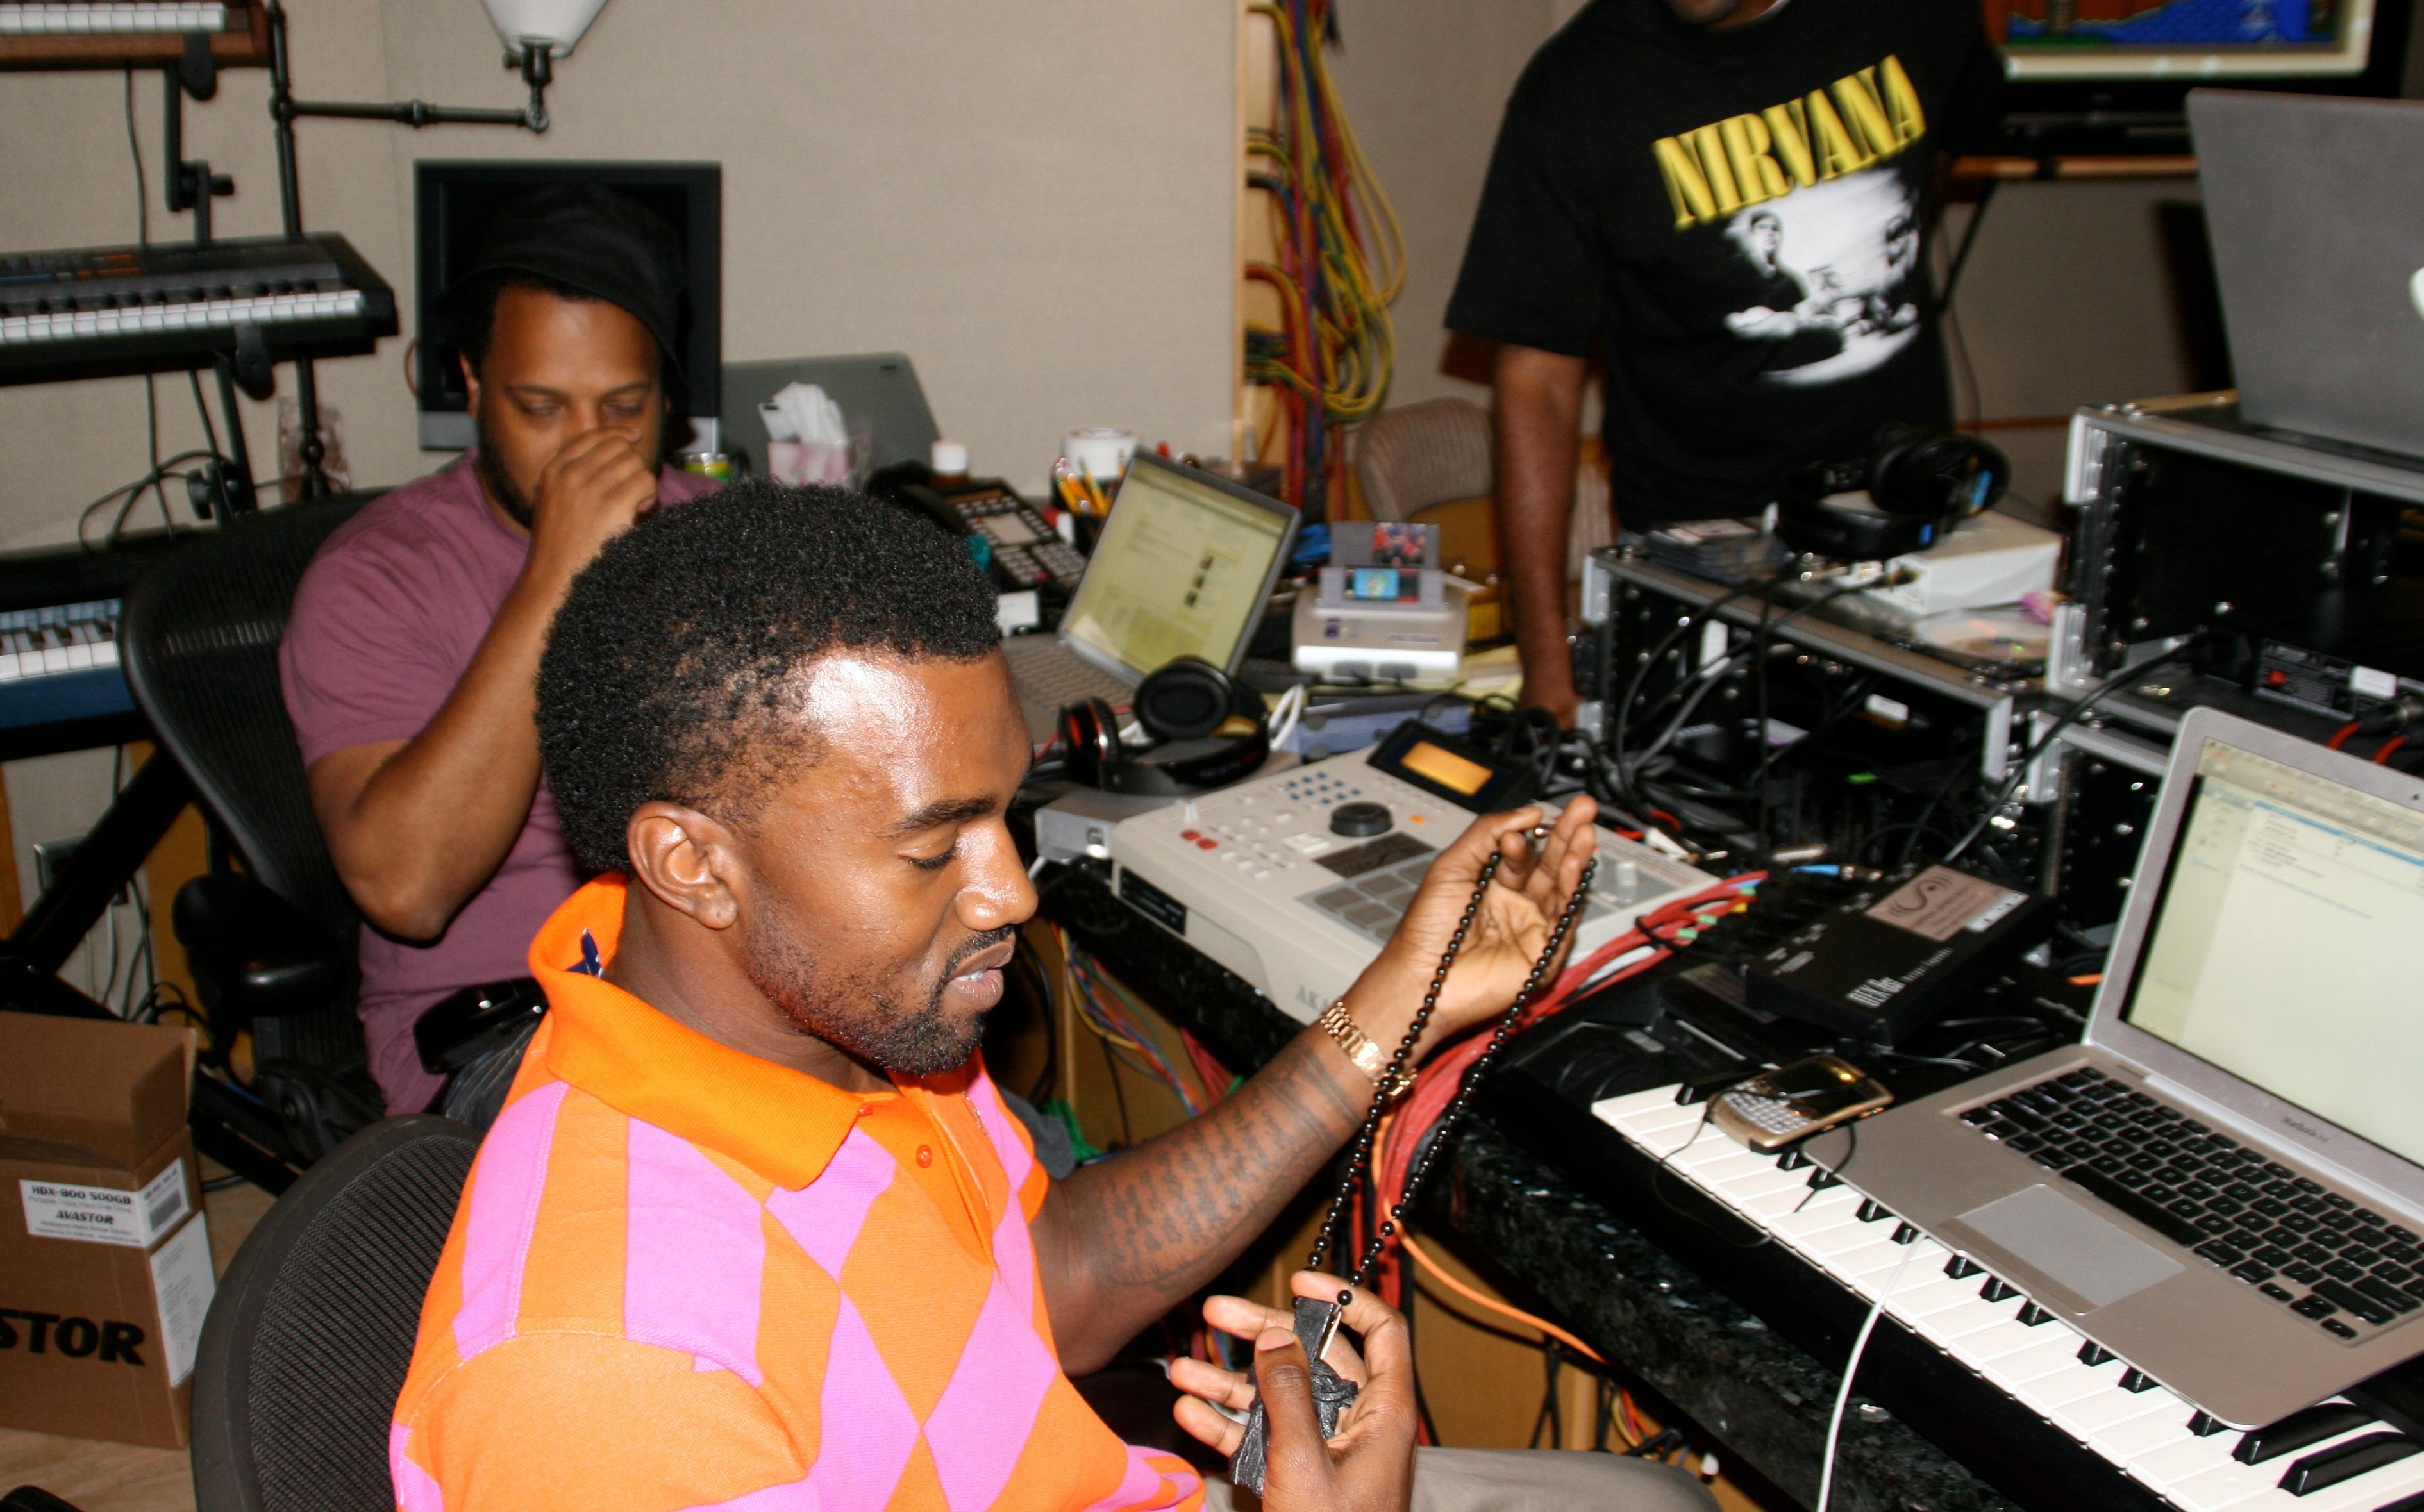 Kanye_West_in_the_Studio.jpg